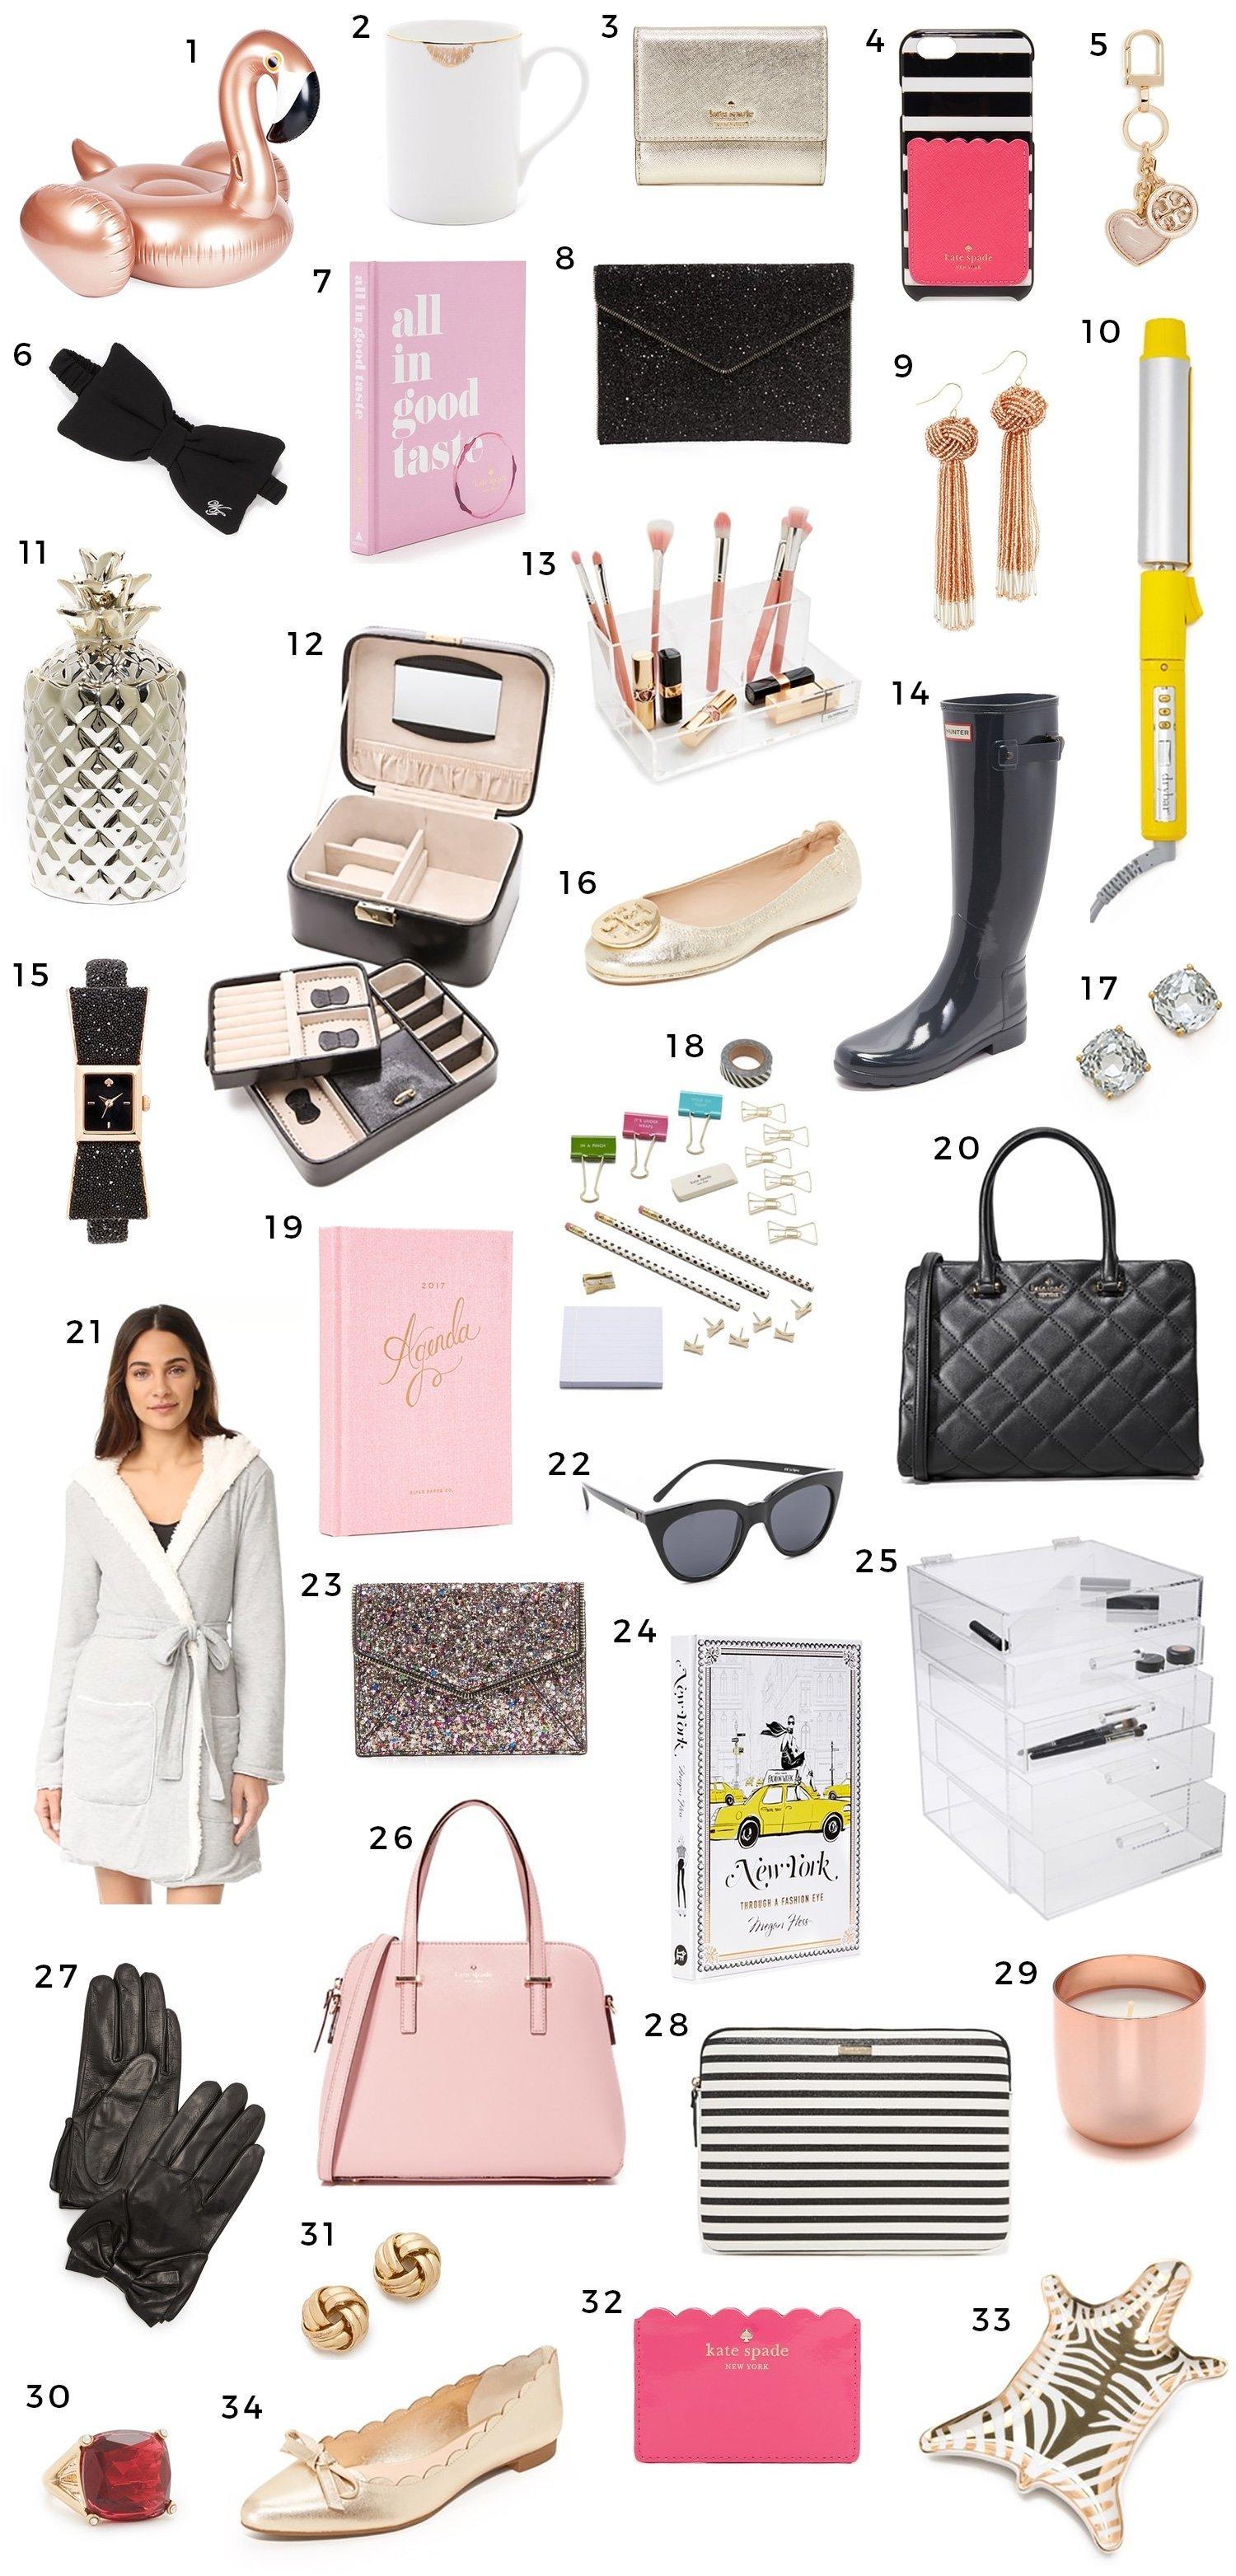 10 Beautiful Gift Ideas For Women 30 christmas gift ideas for women girly girls ashley brooke 4